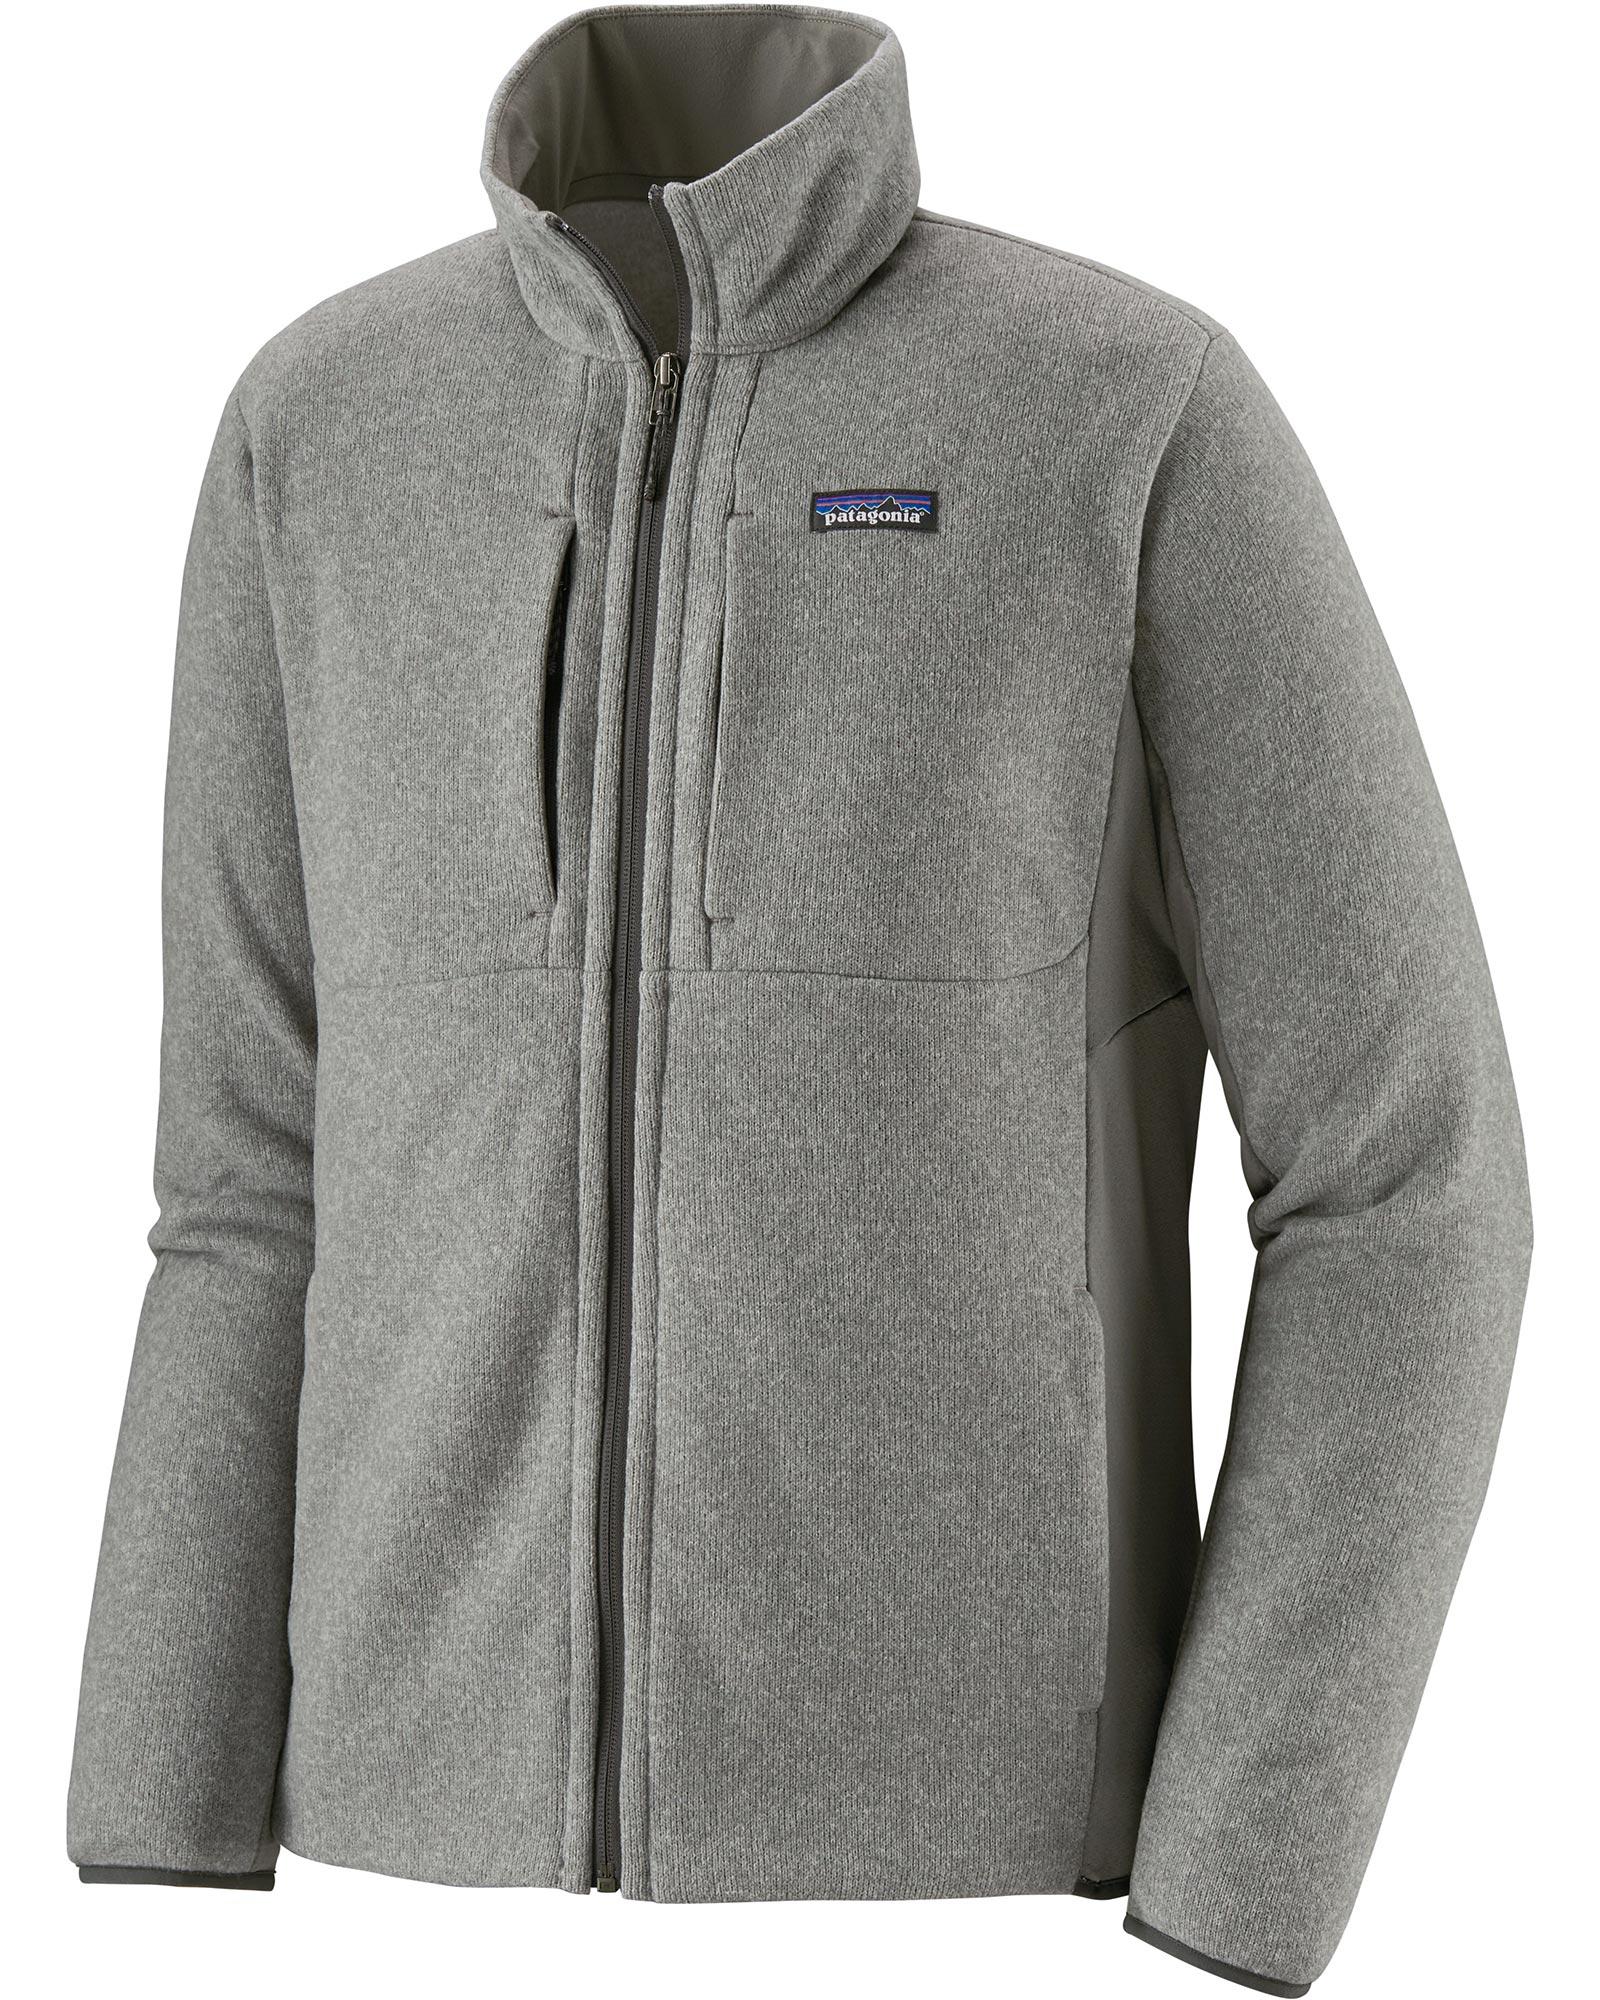 Patagonia Lwt Better Sweater Men's Jacket 0